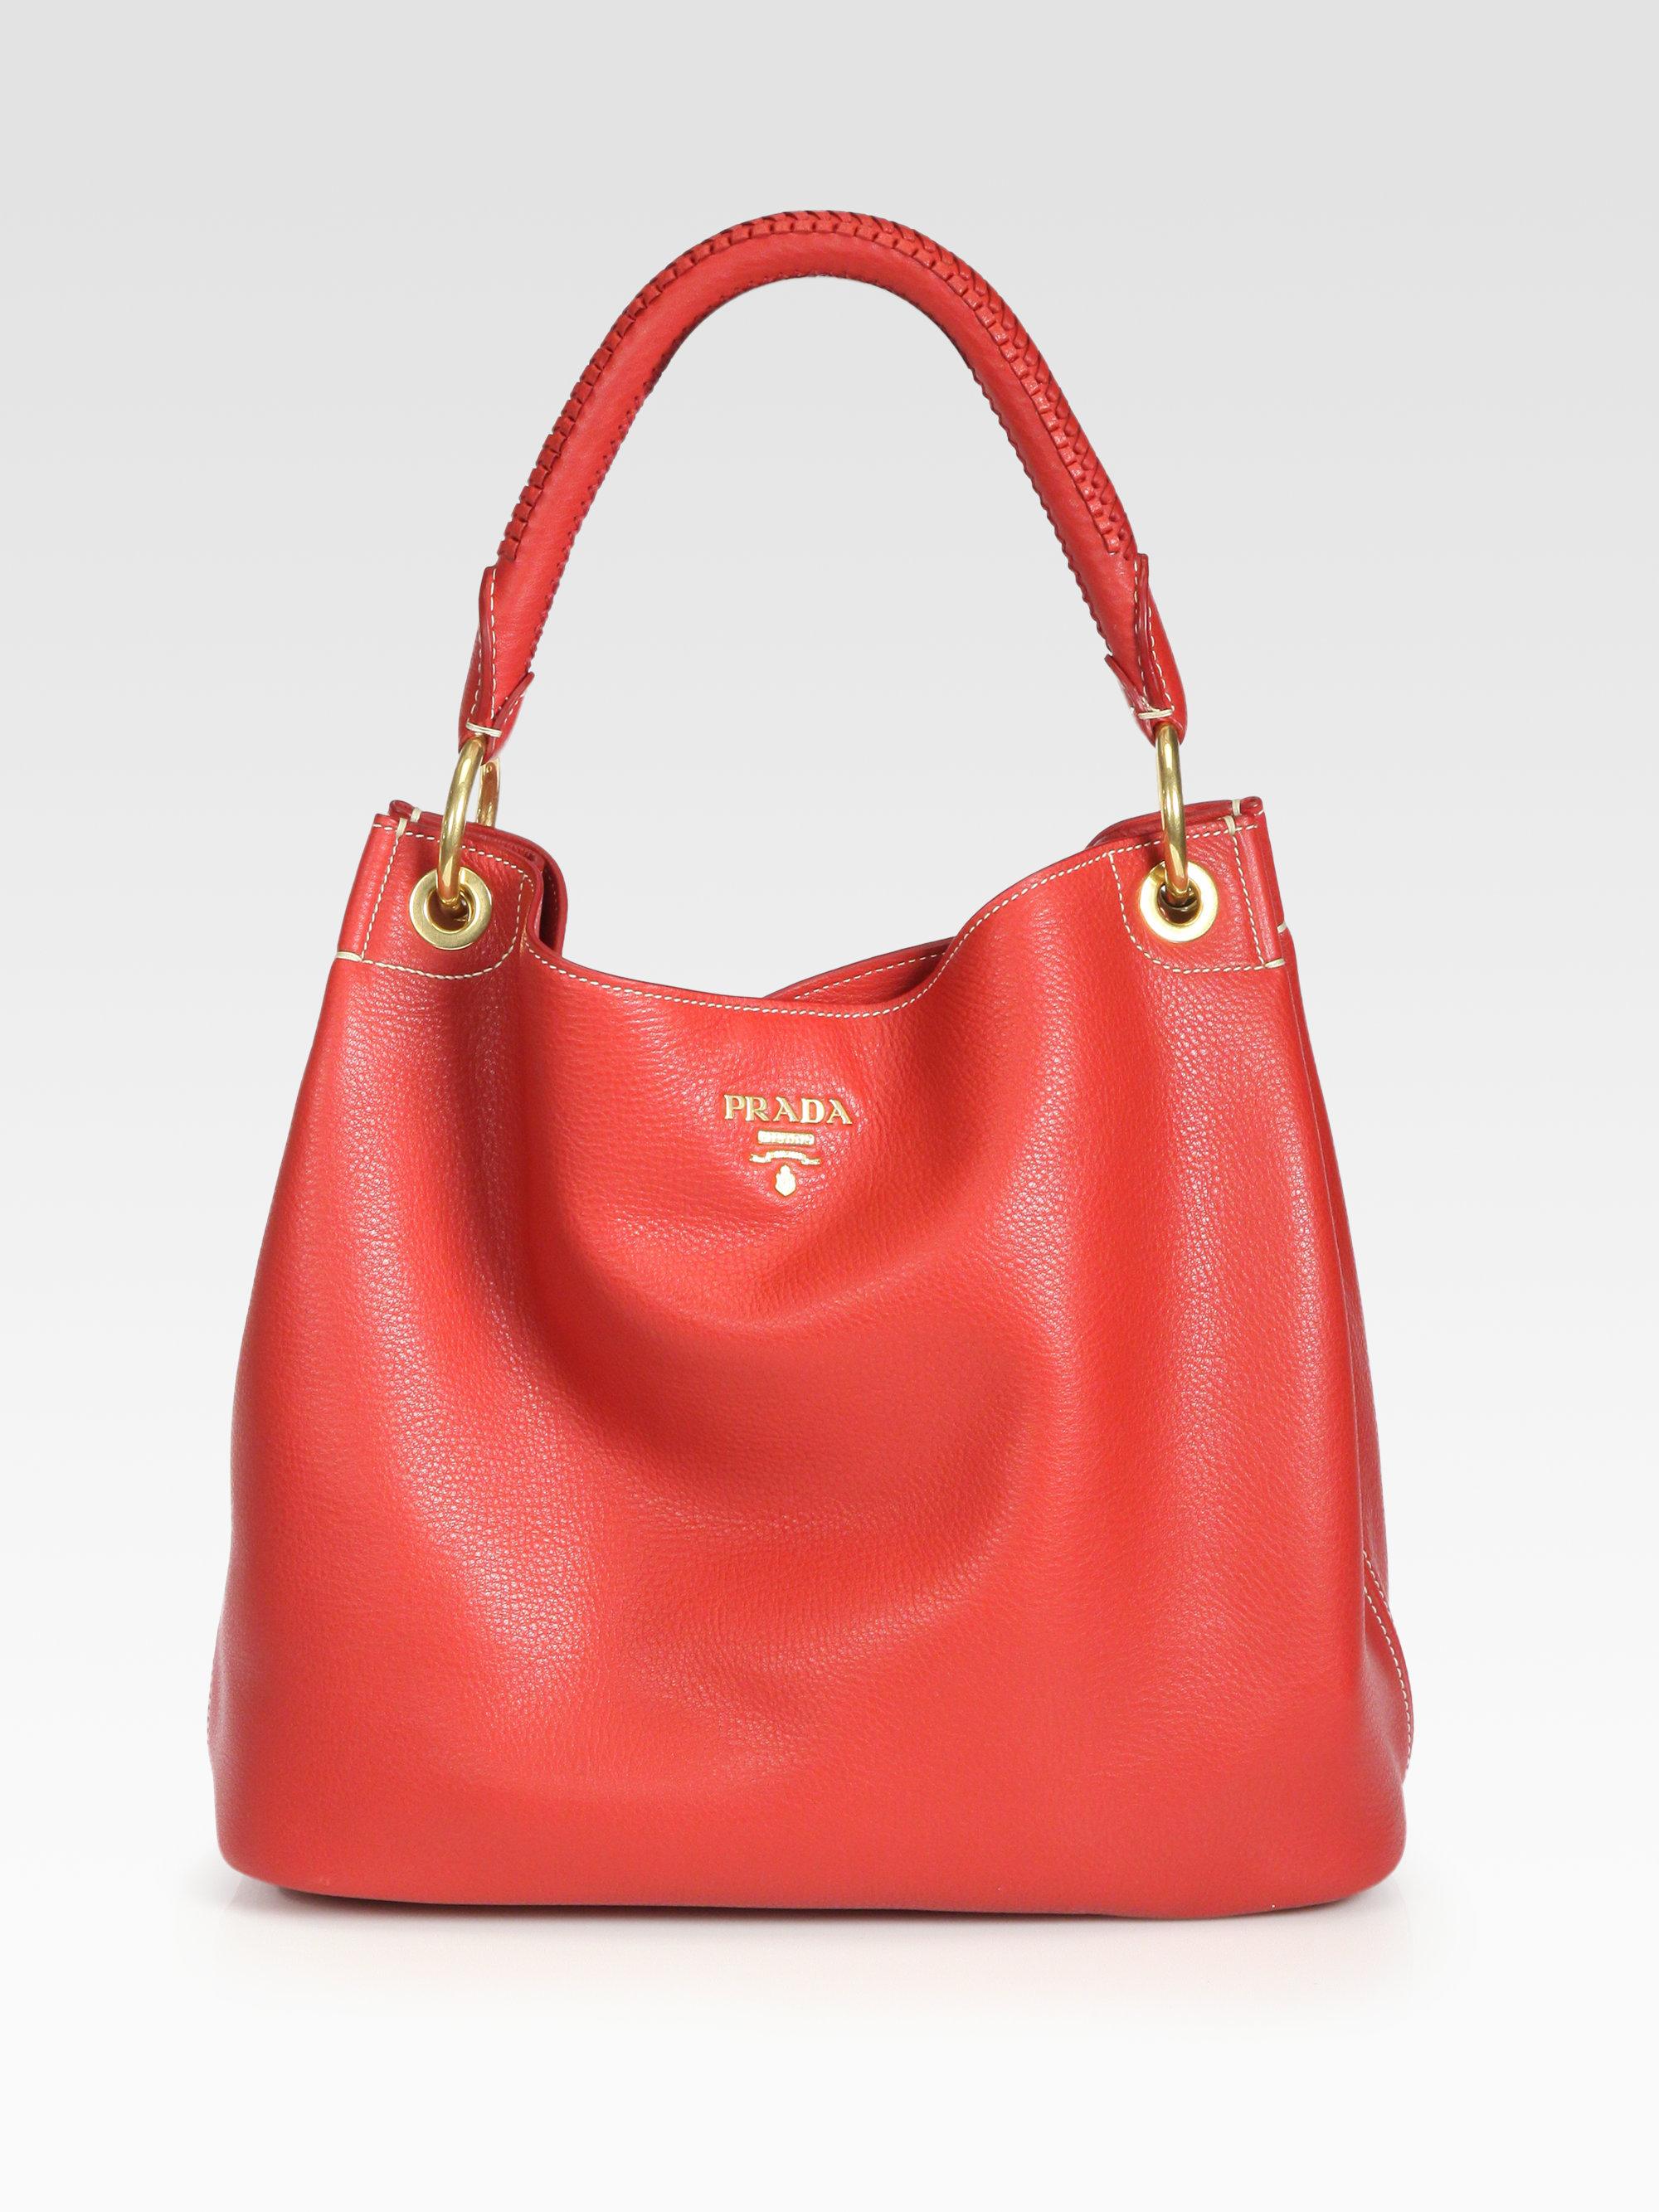 Lyst - Prada Vitello Daino Hobo Bag in Red ce2a43cca5